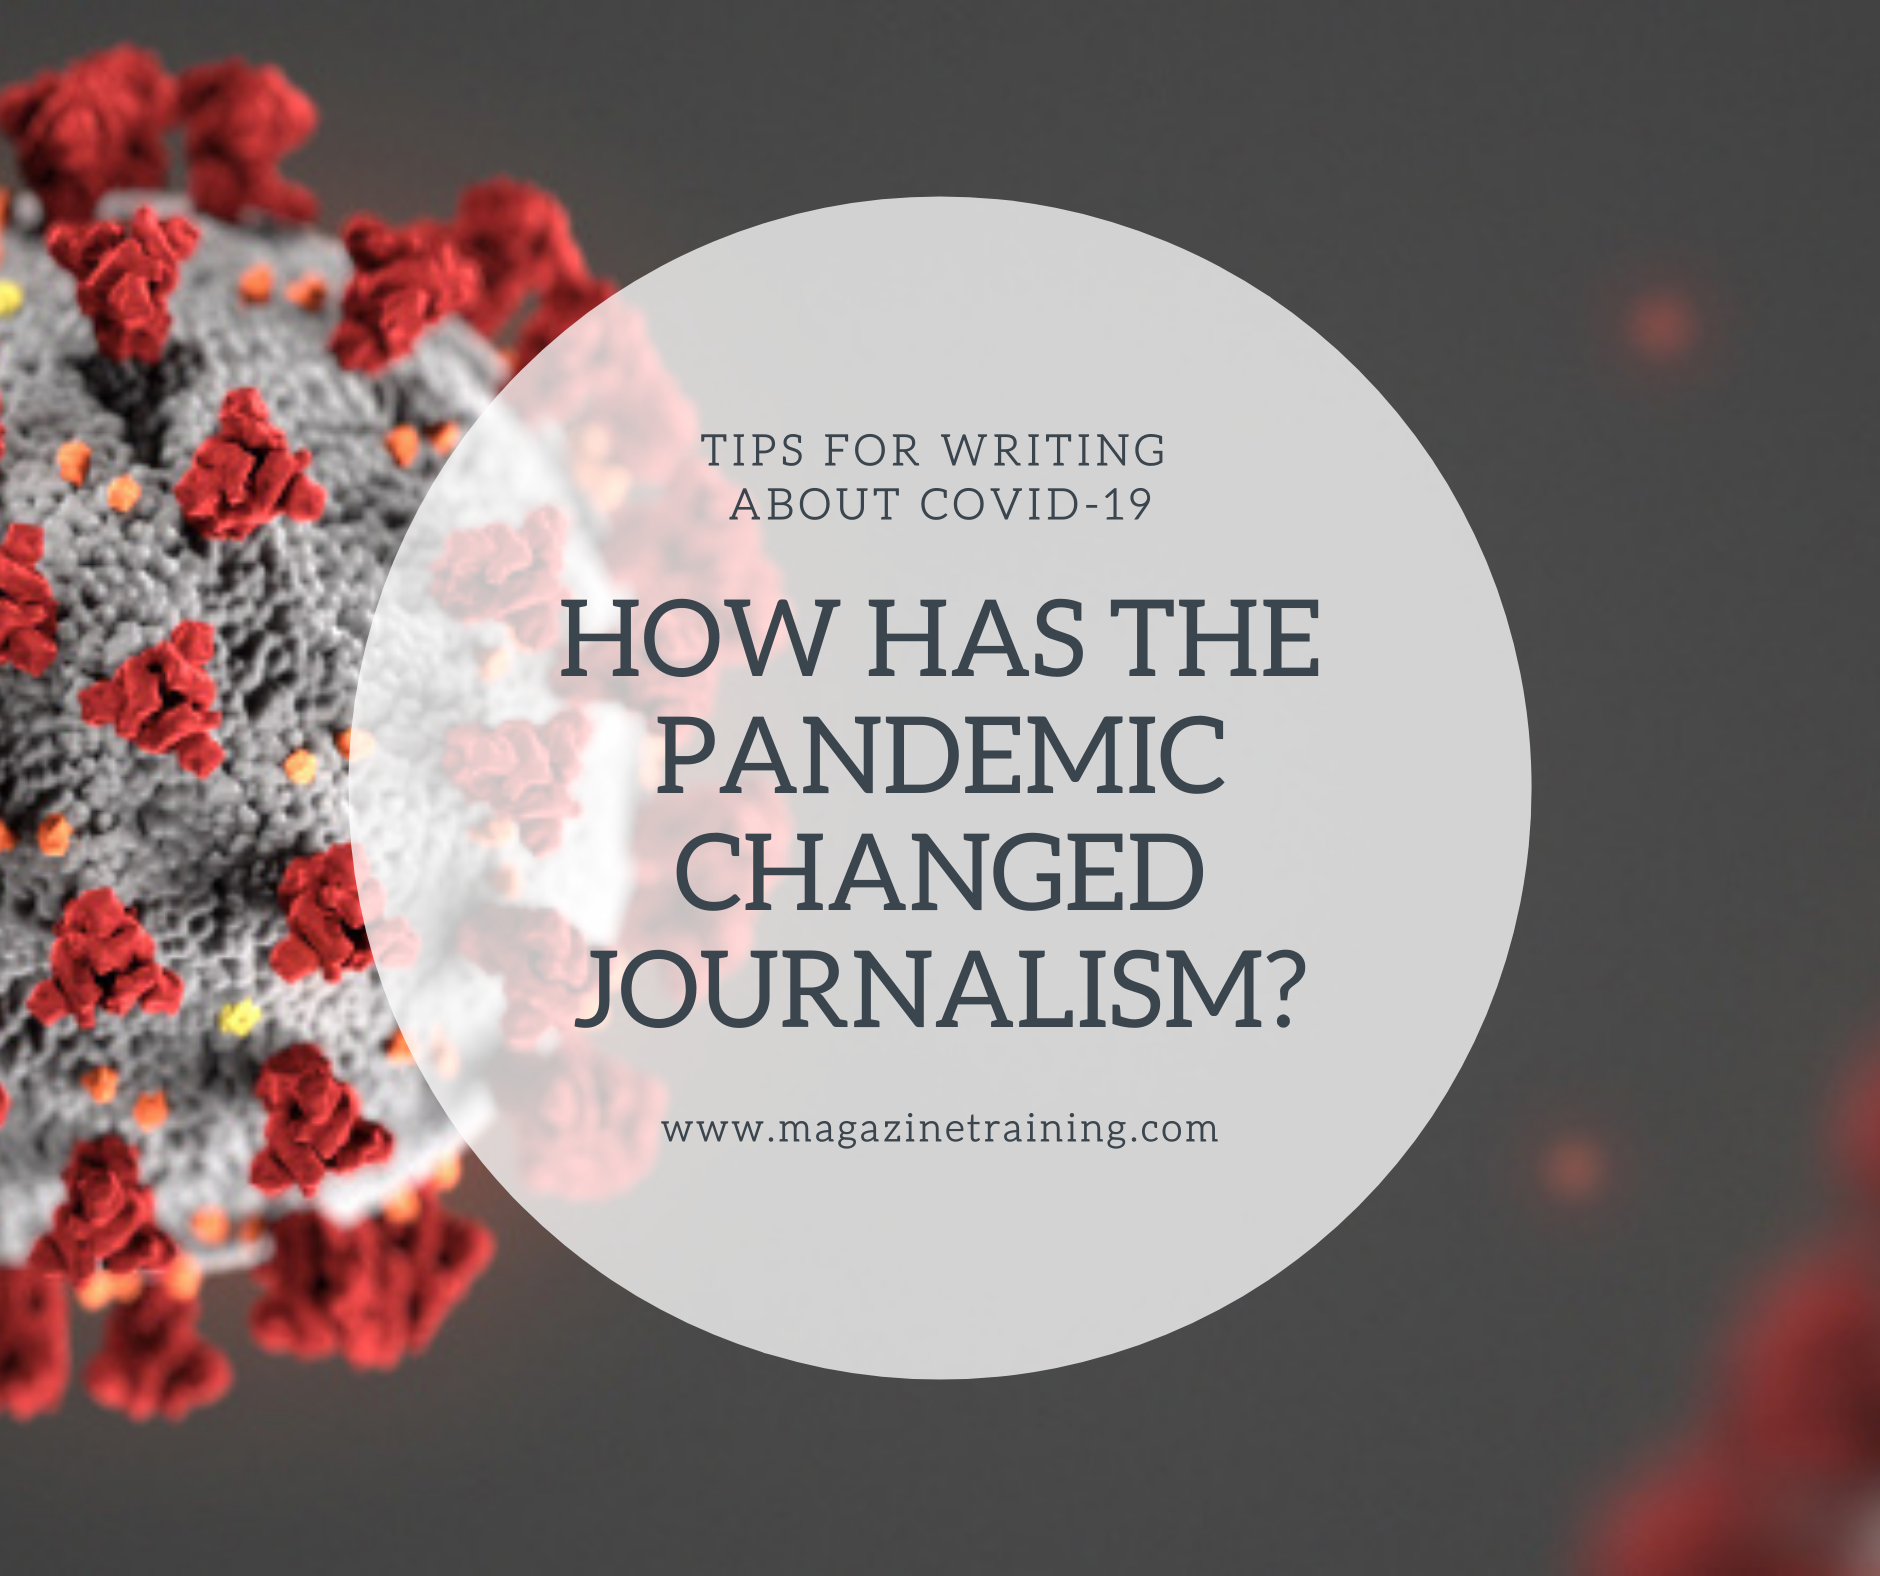 pandemic changed journalism